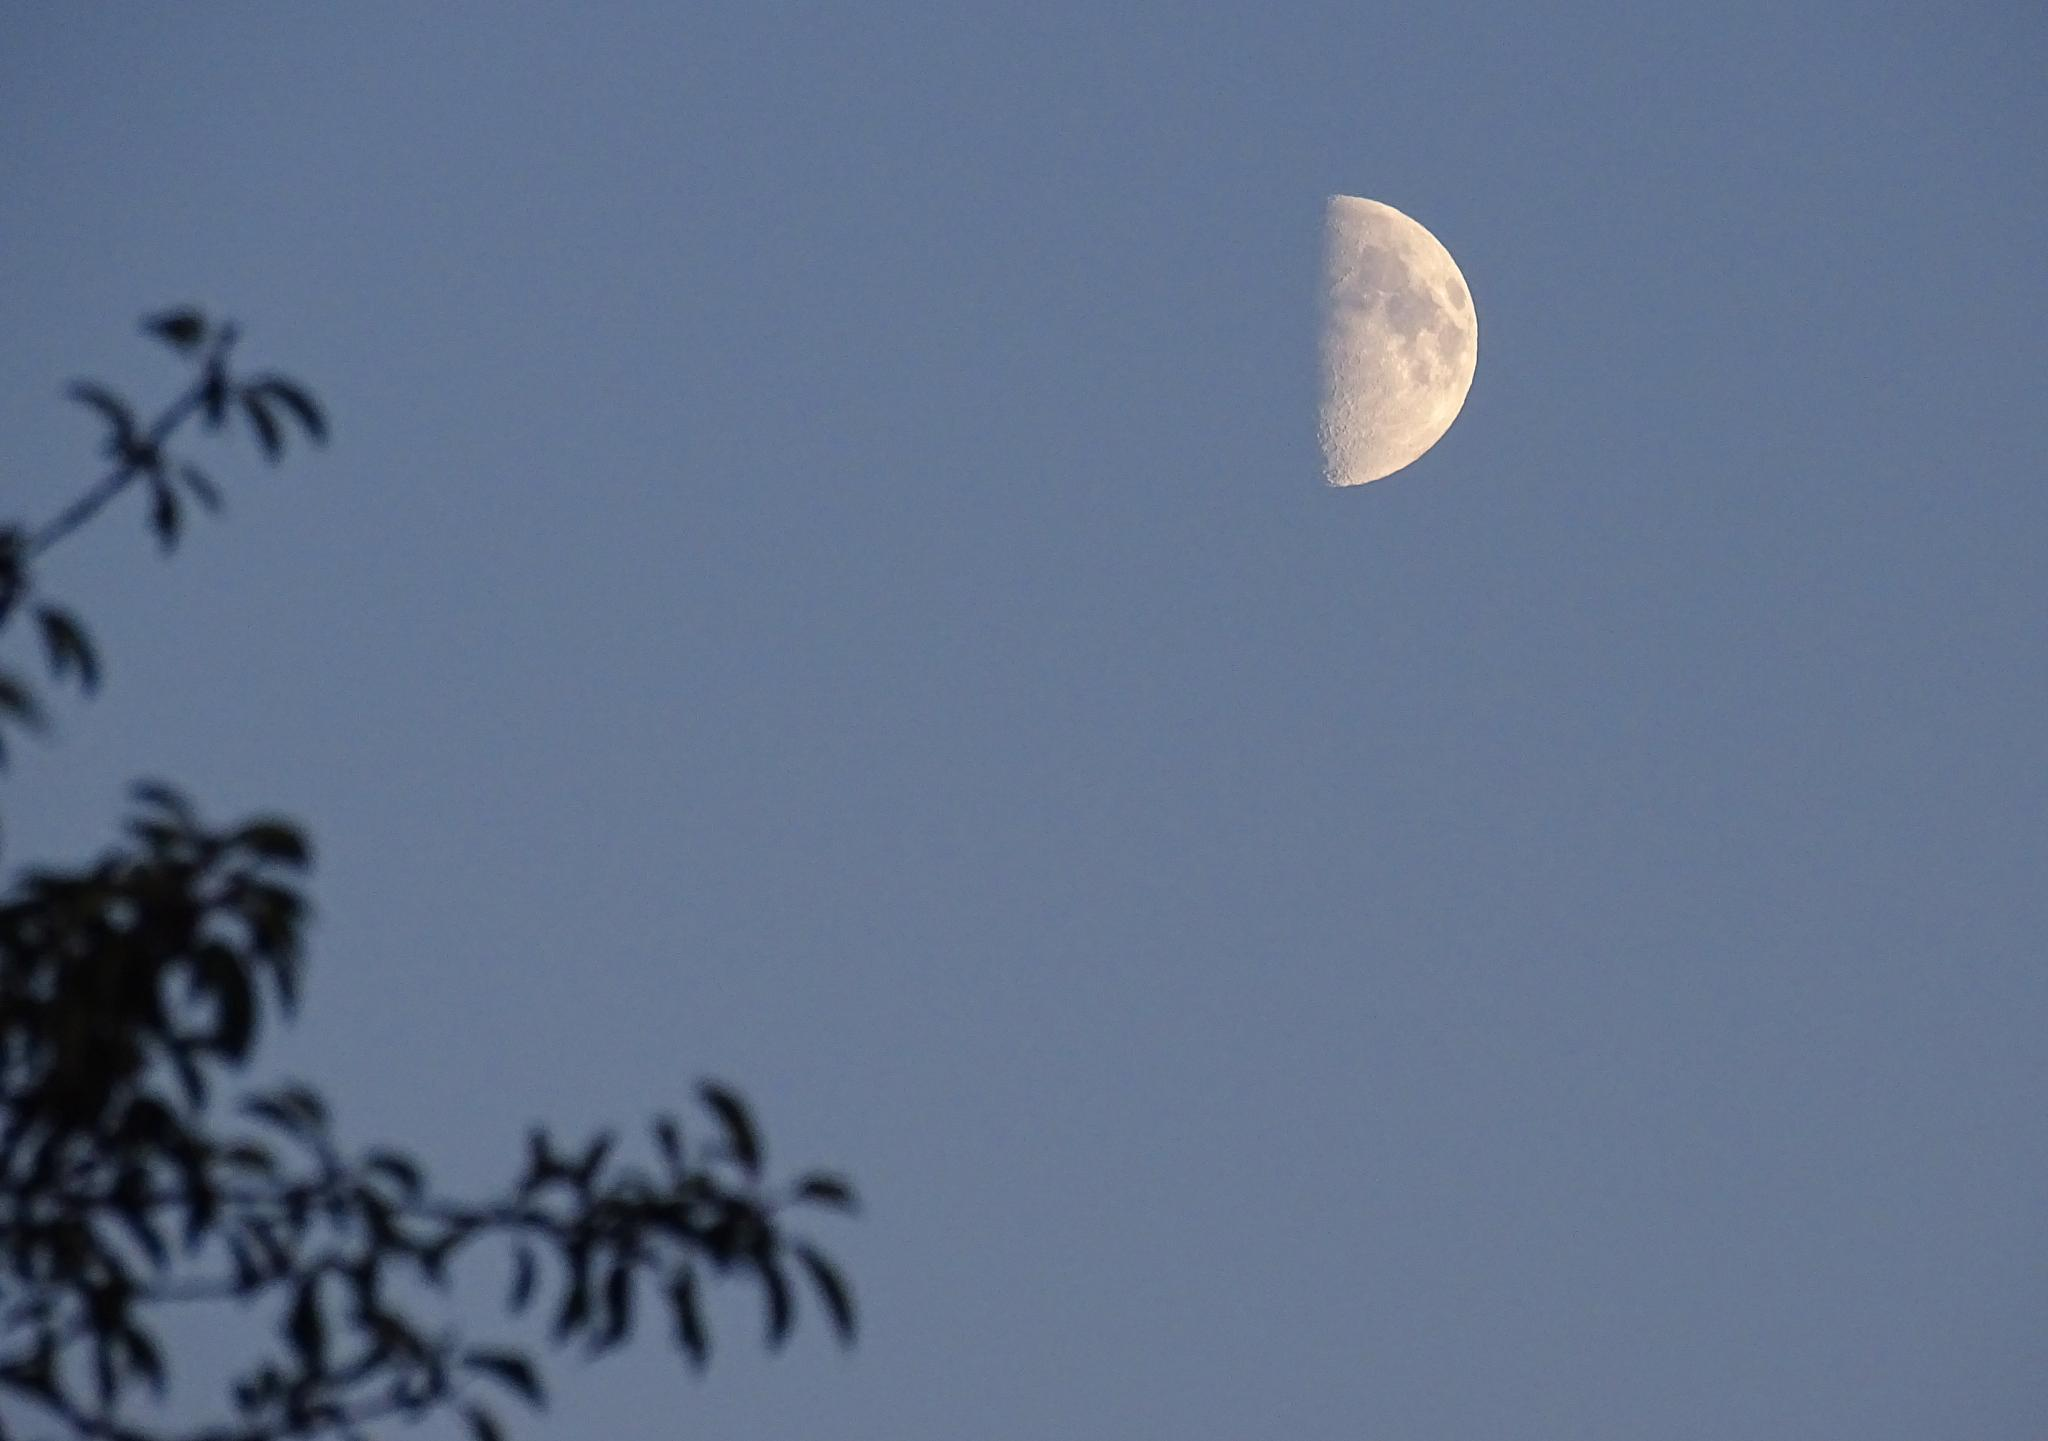 The moon a few days ago  by Pian